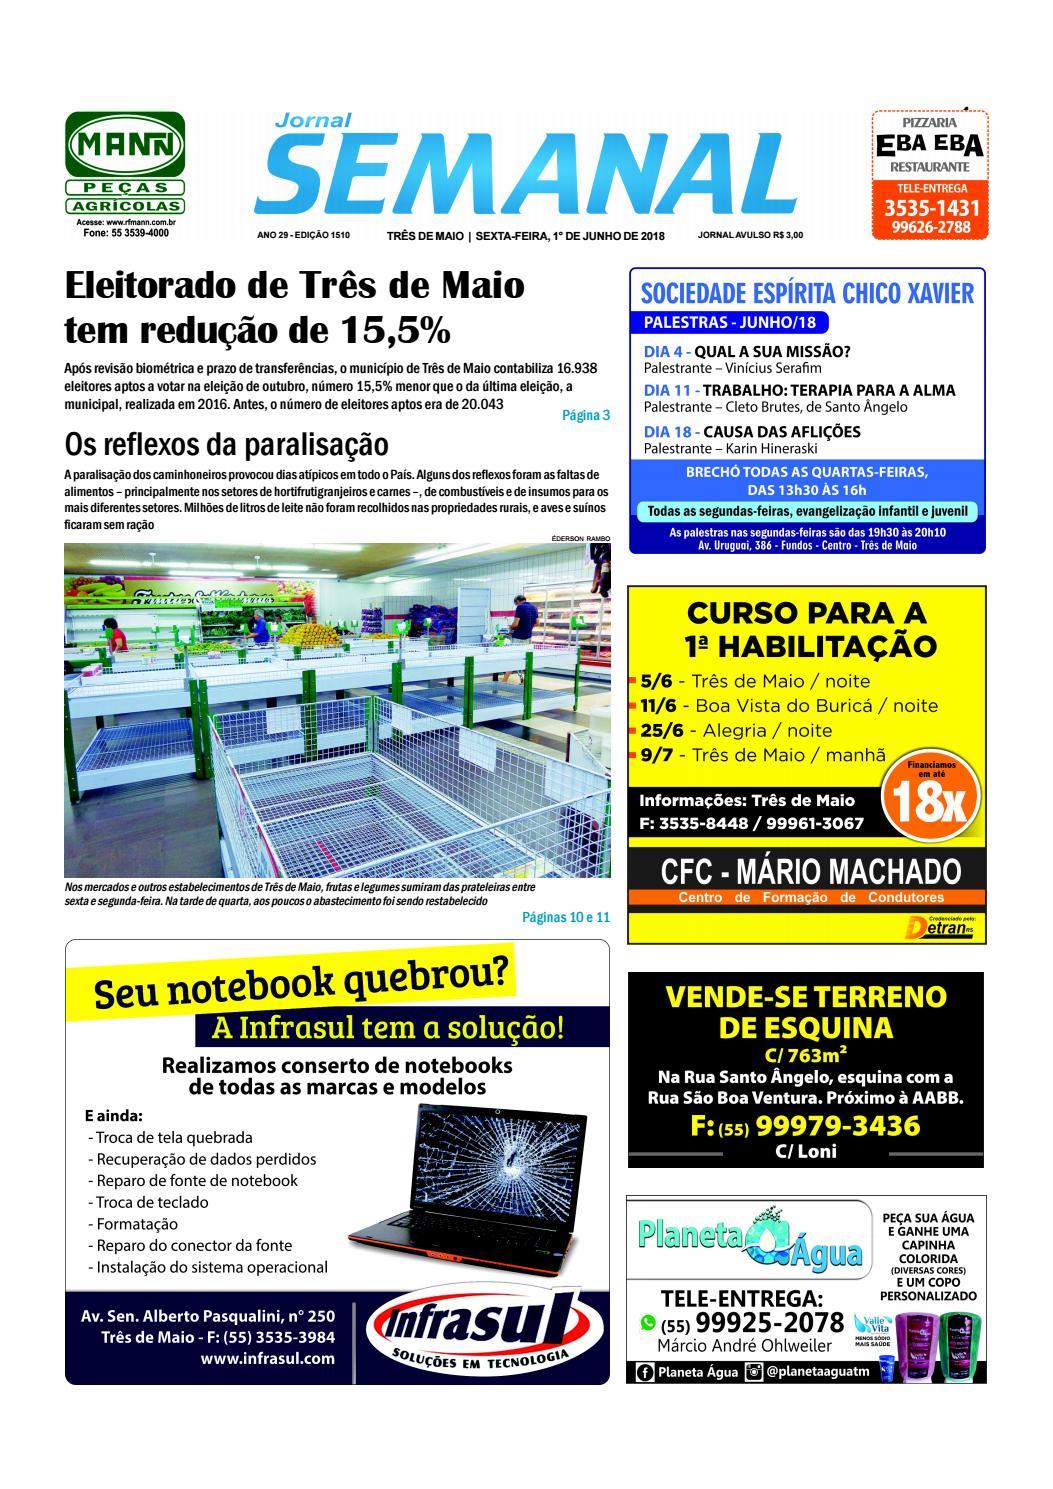 8569b74ee99 Semanal 1º de junho de 2018 - Ed. 1510 by JORNAL Semanal - issuu